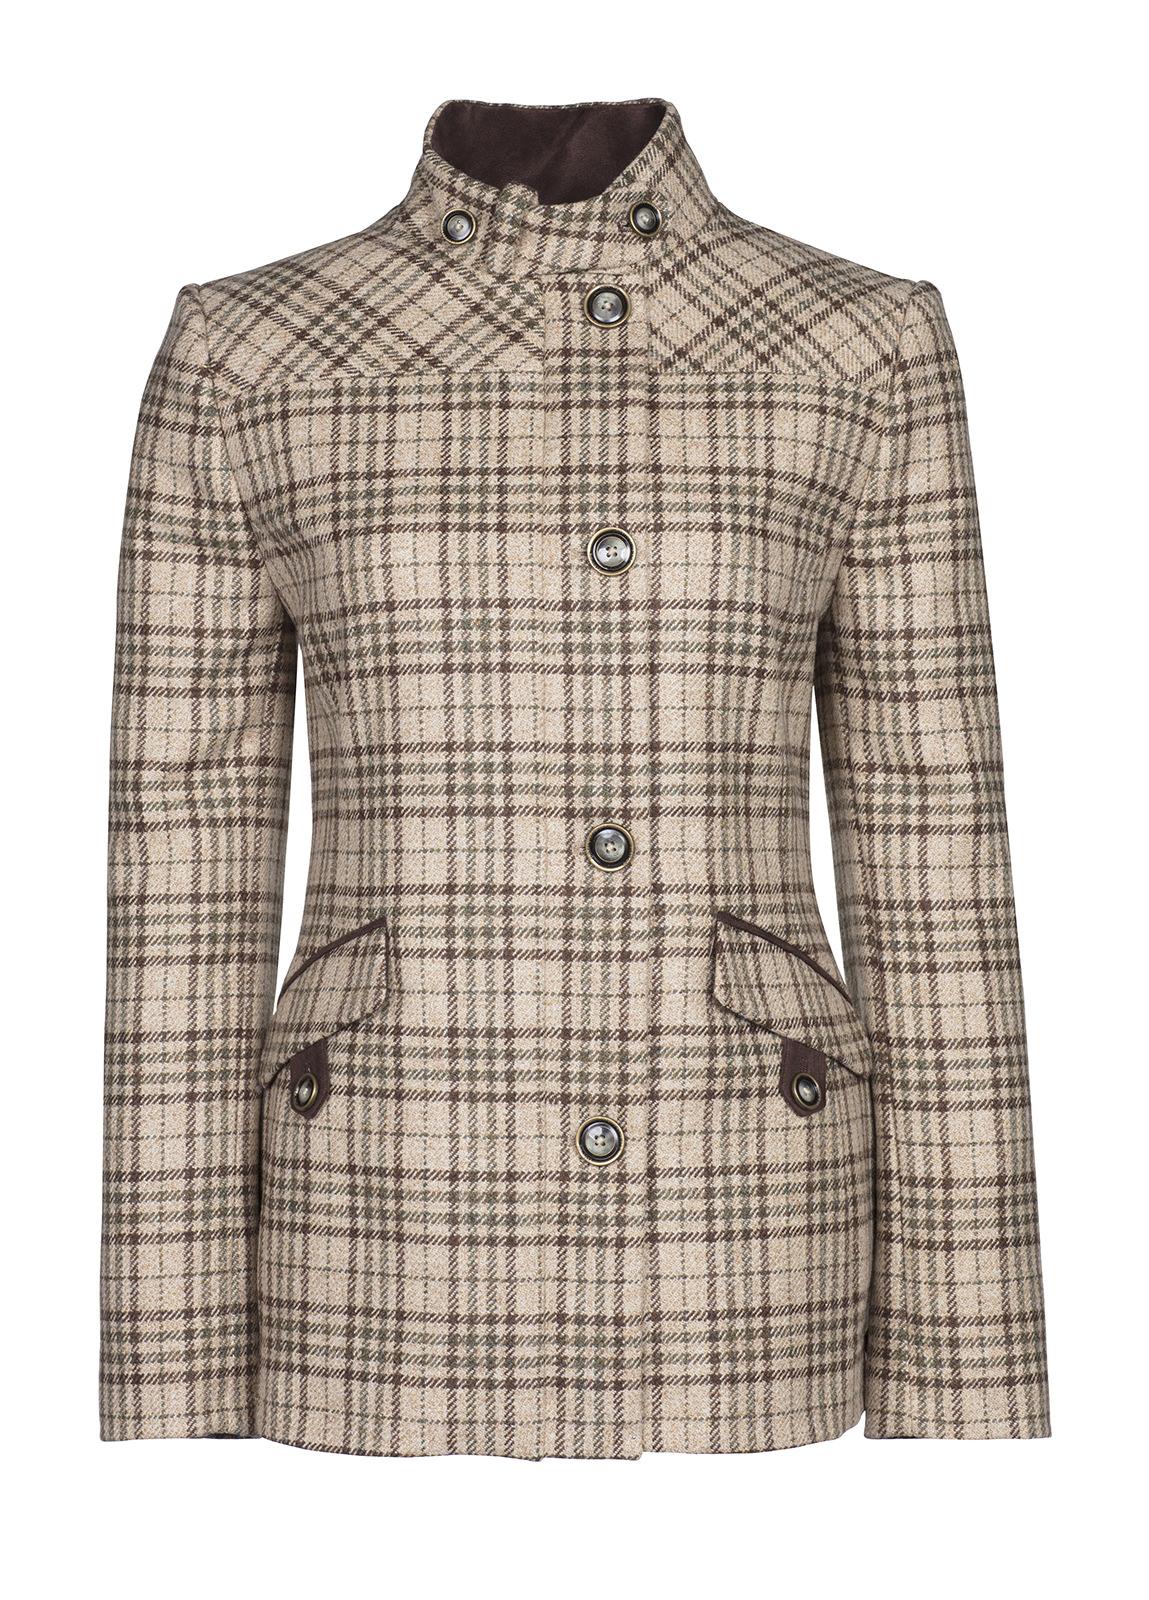 Dubarry_ Heatherbell Tweed Jacket - Pebble_Image_2